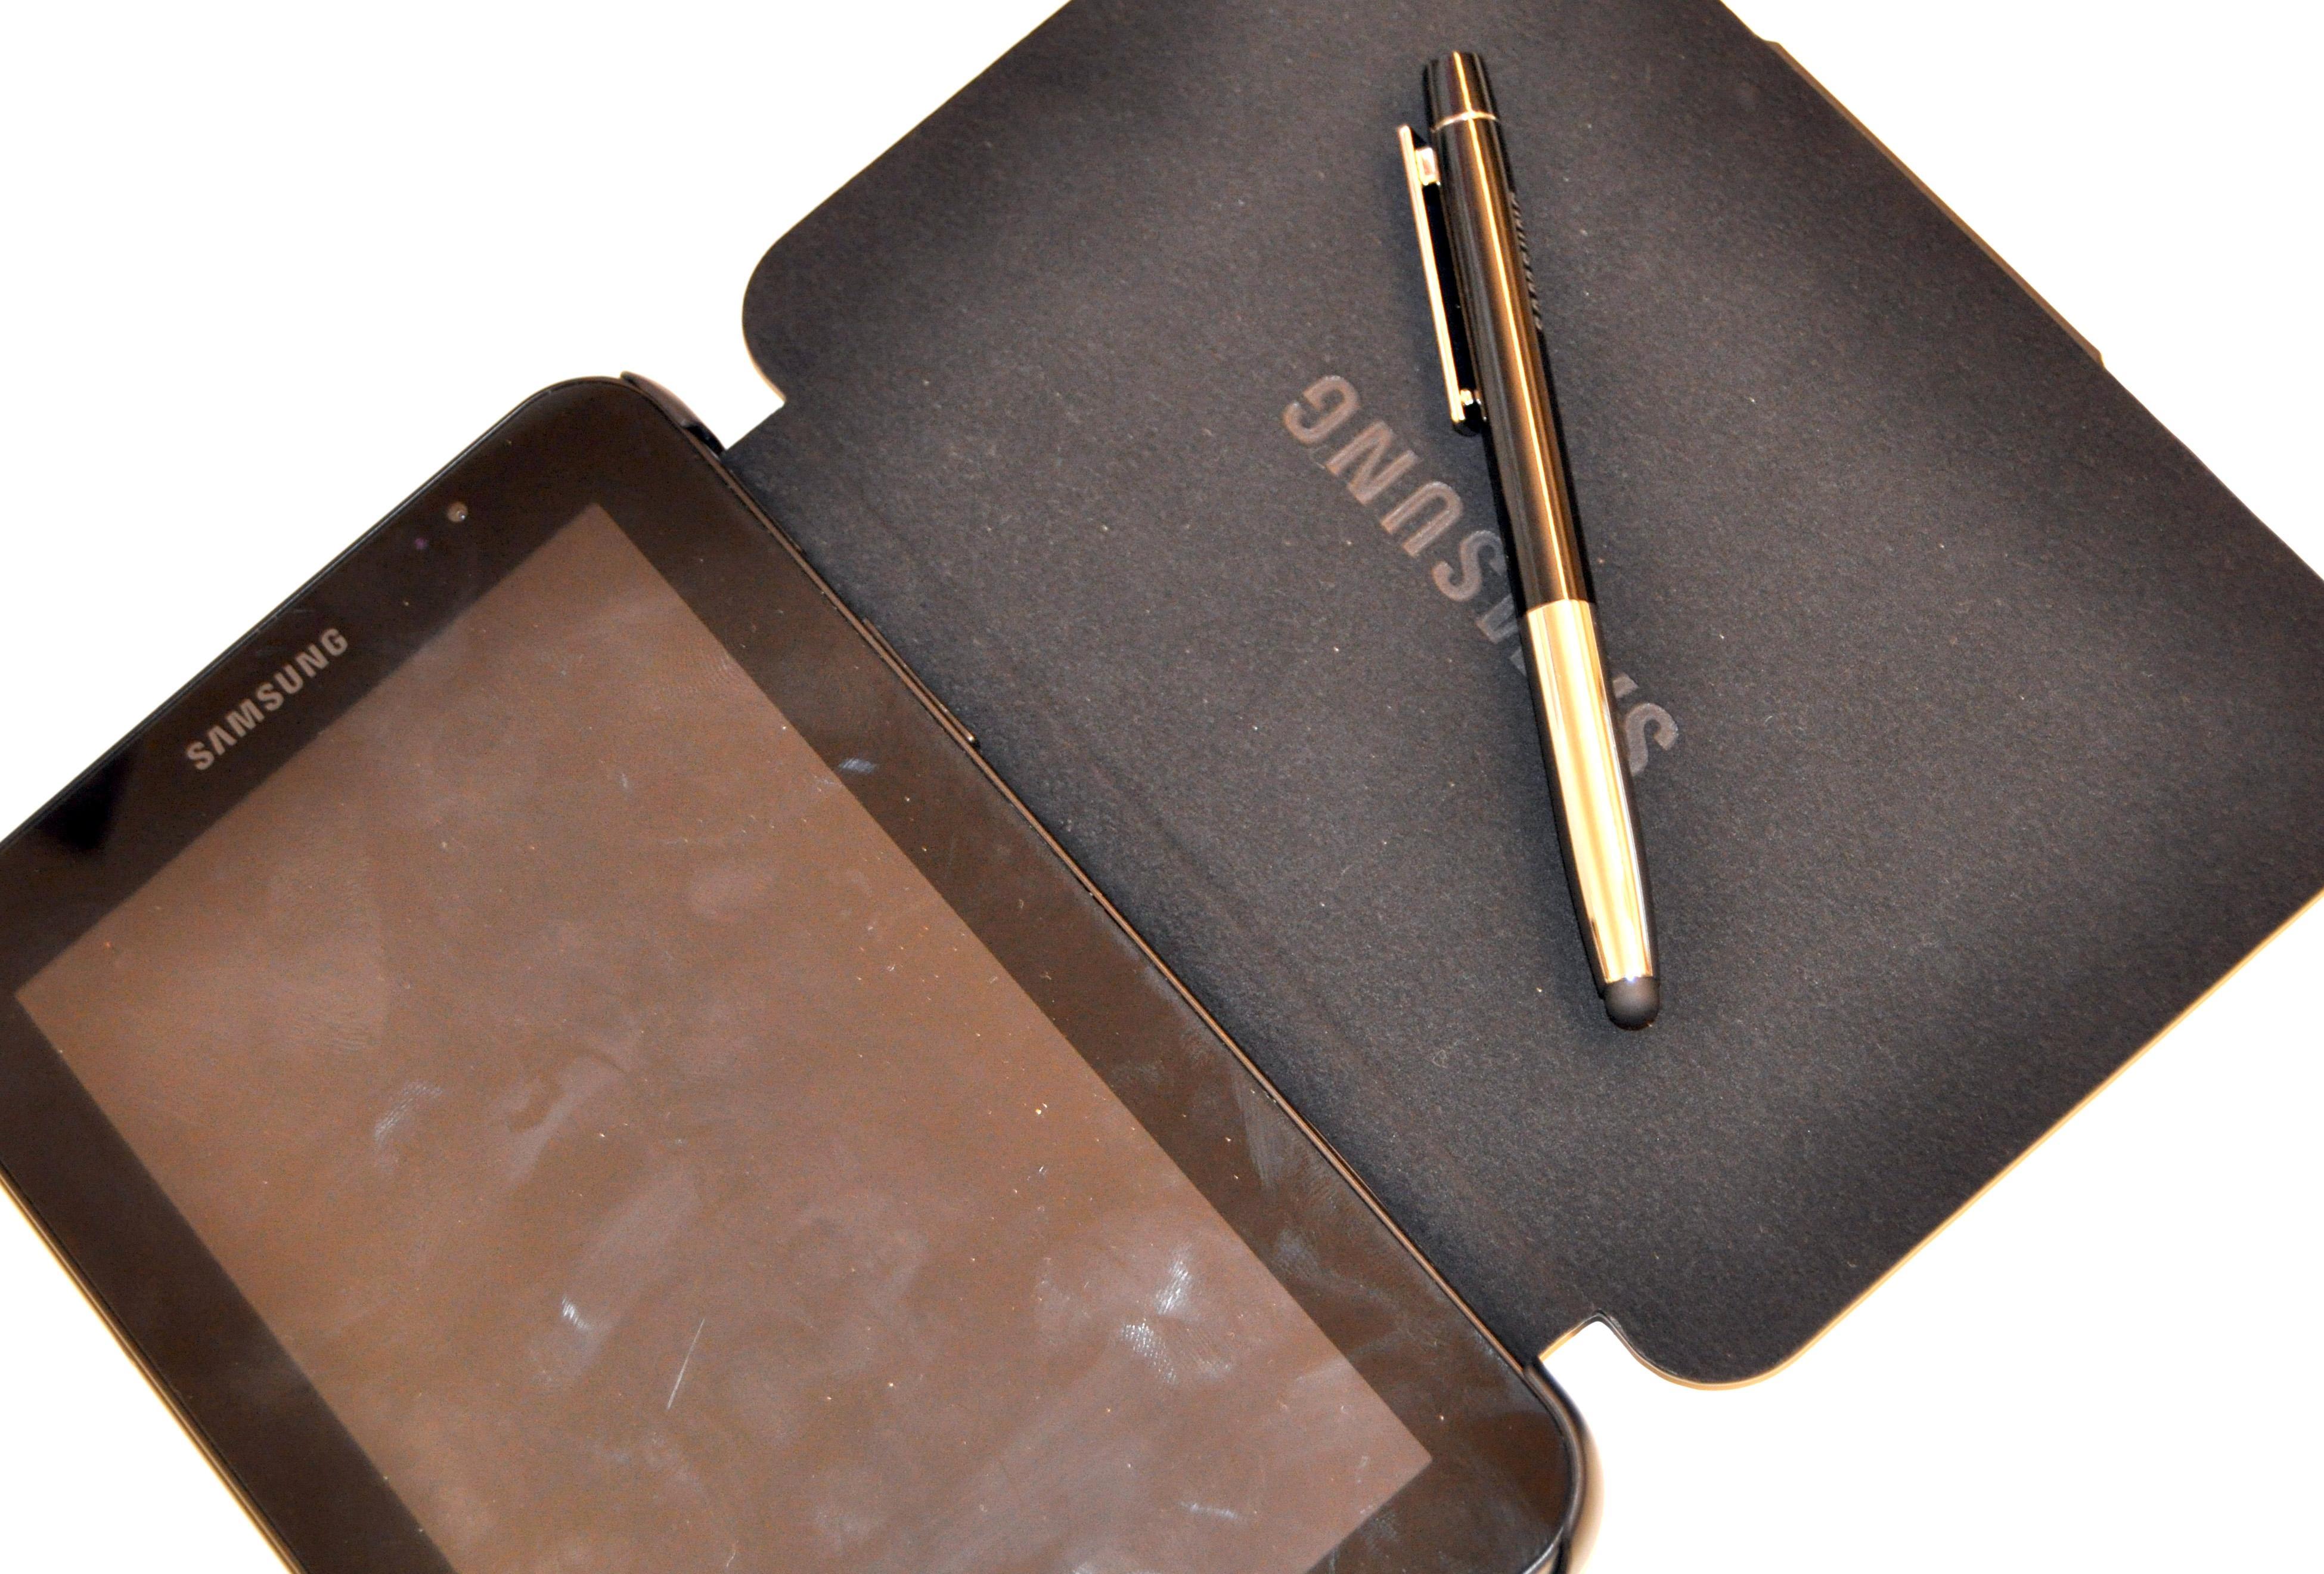 Futteral og penn til bruk på Galaxy Tab. Futteralet koster omkring 250 kroner.